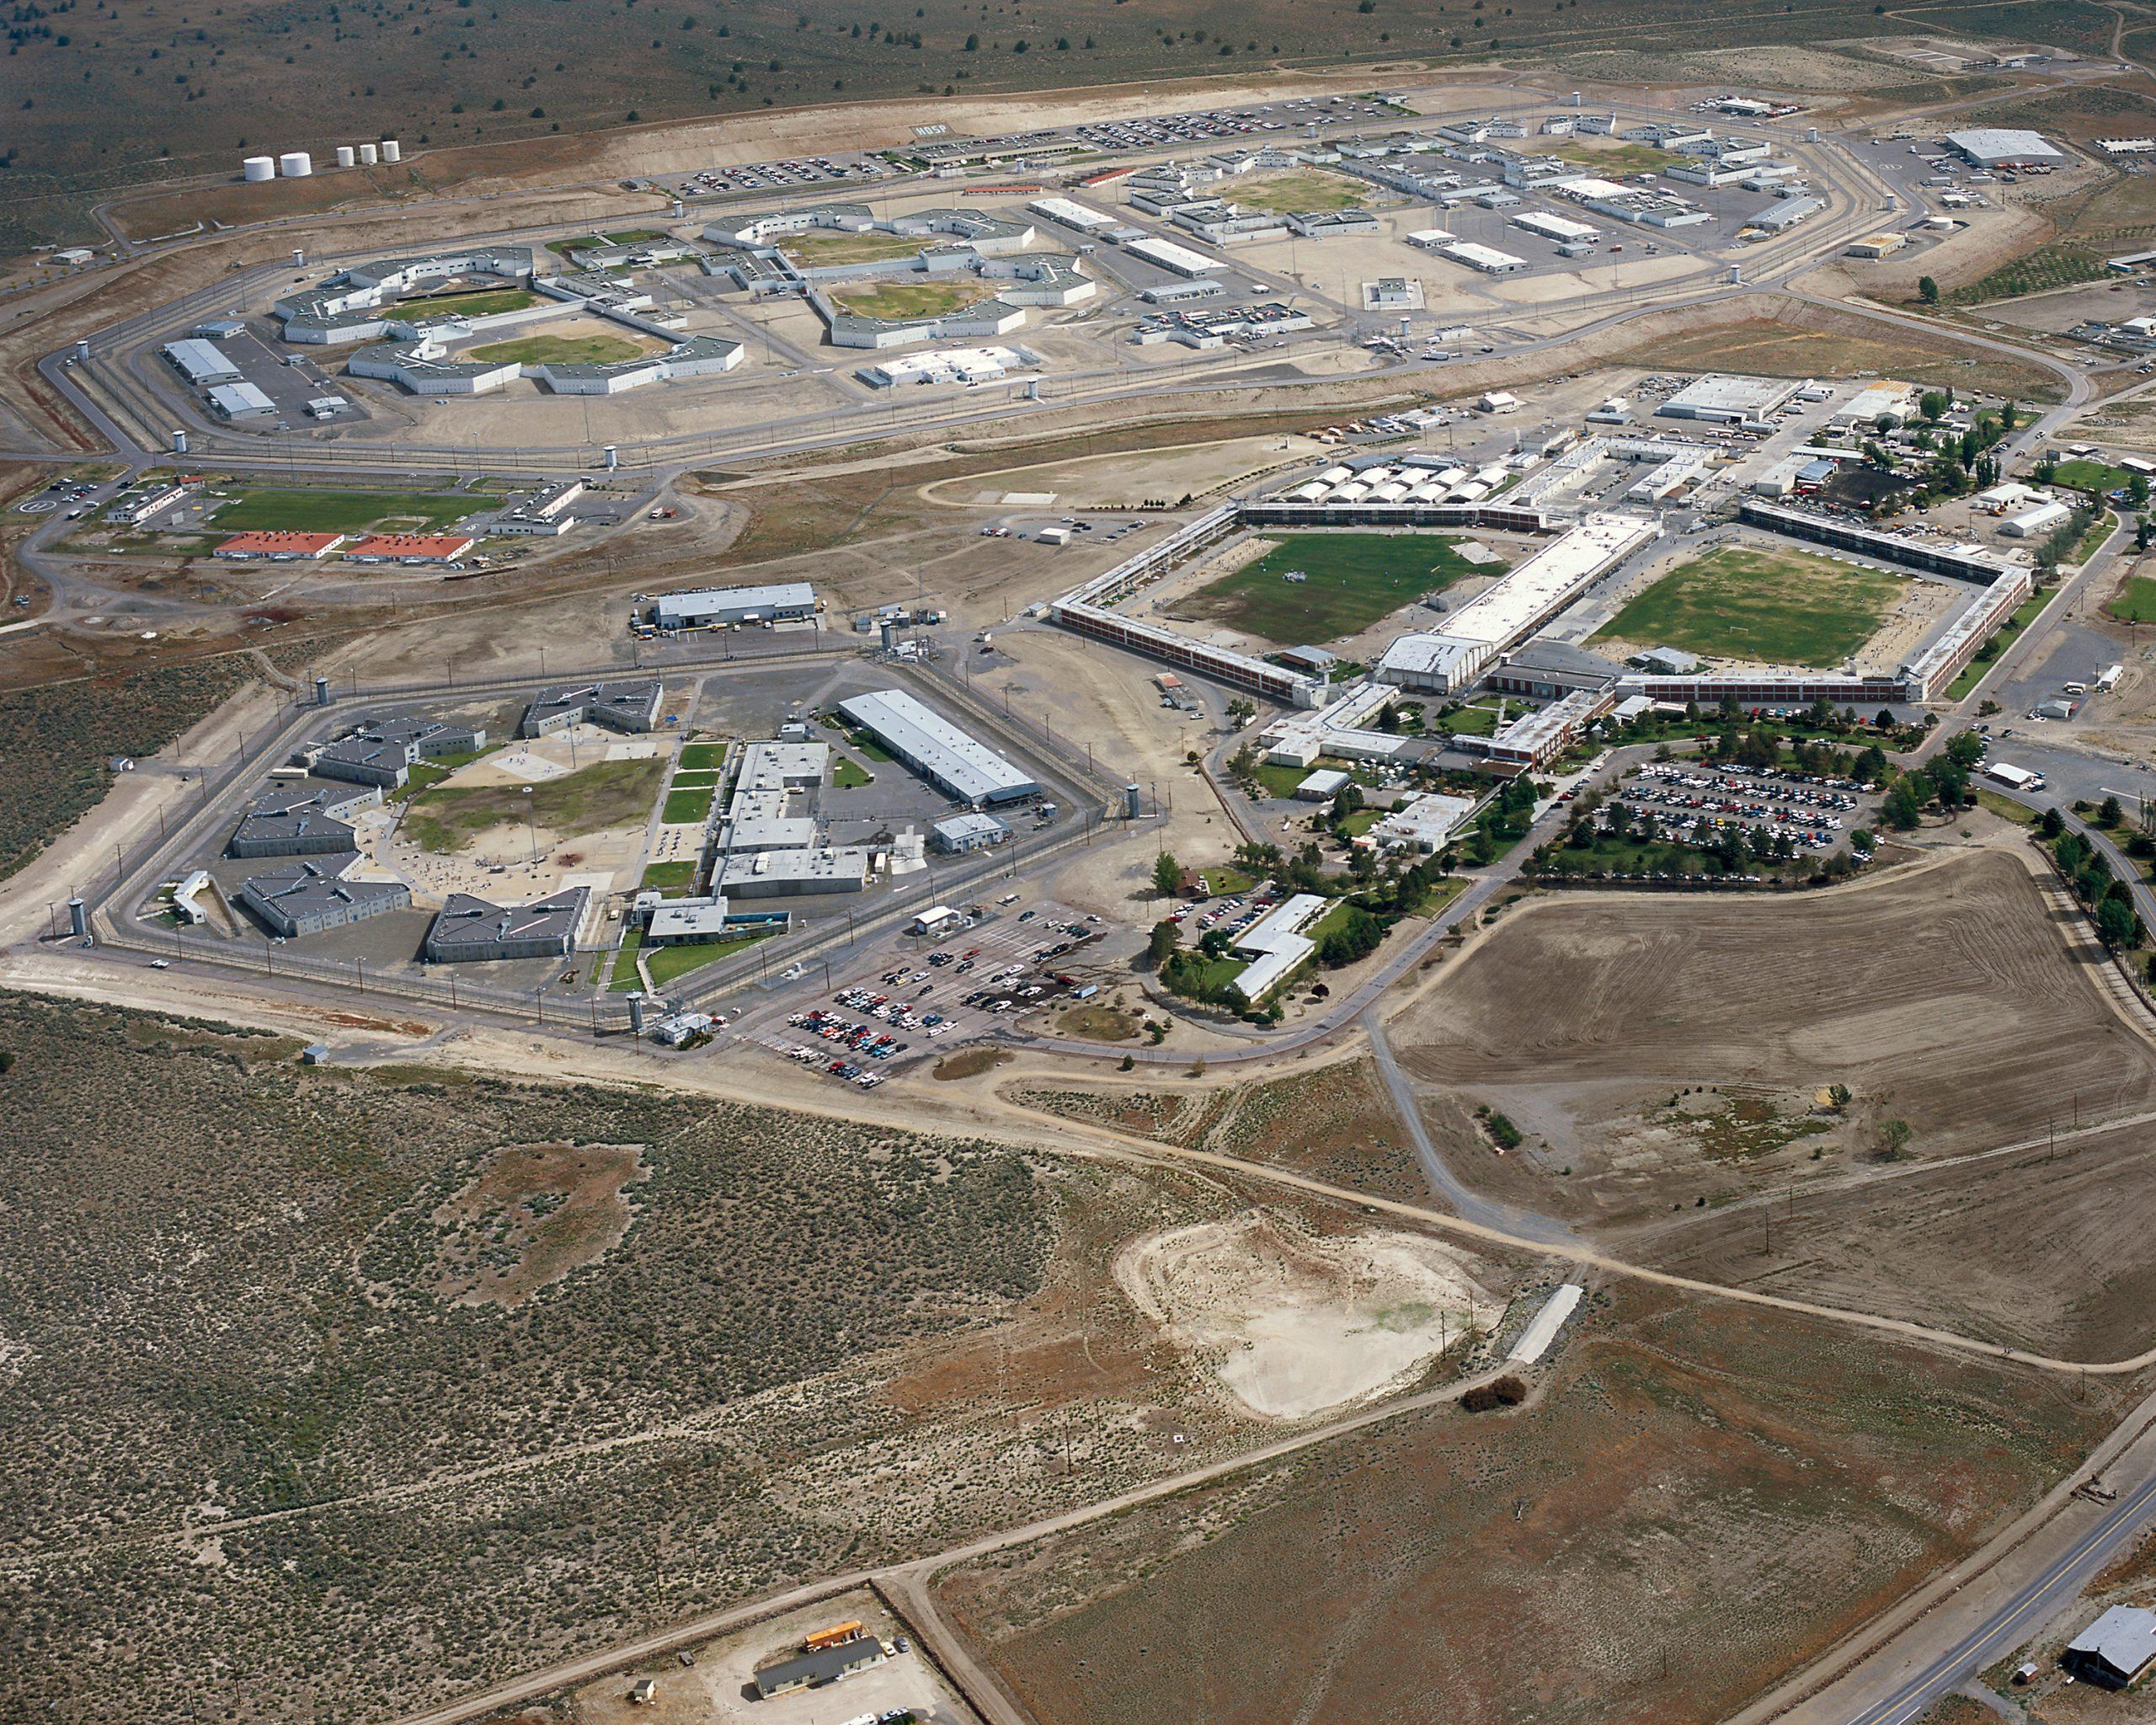 California Correctional Center aerial view.